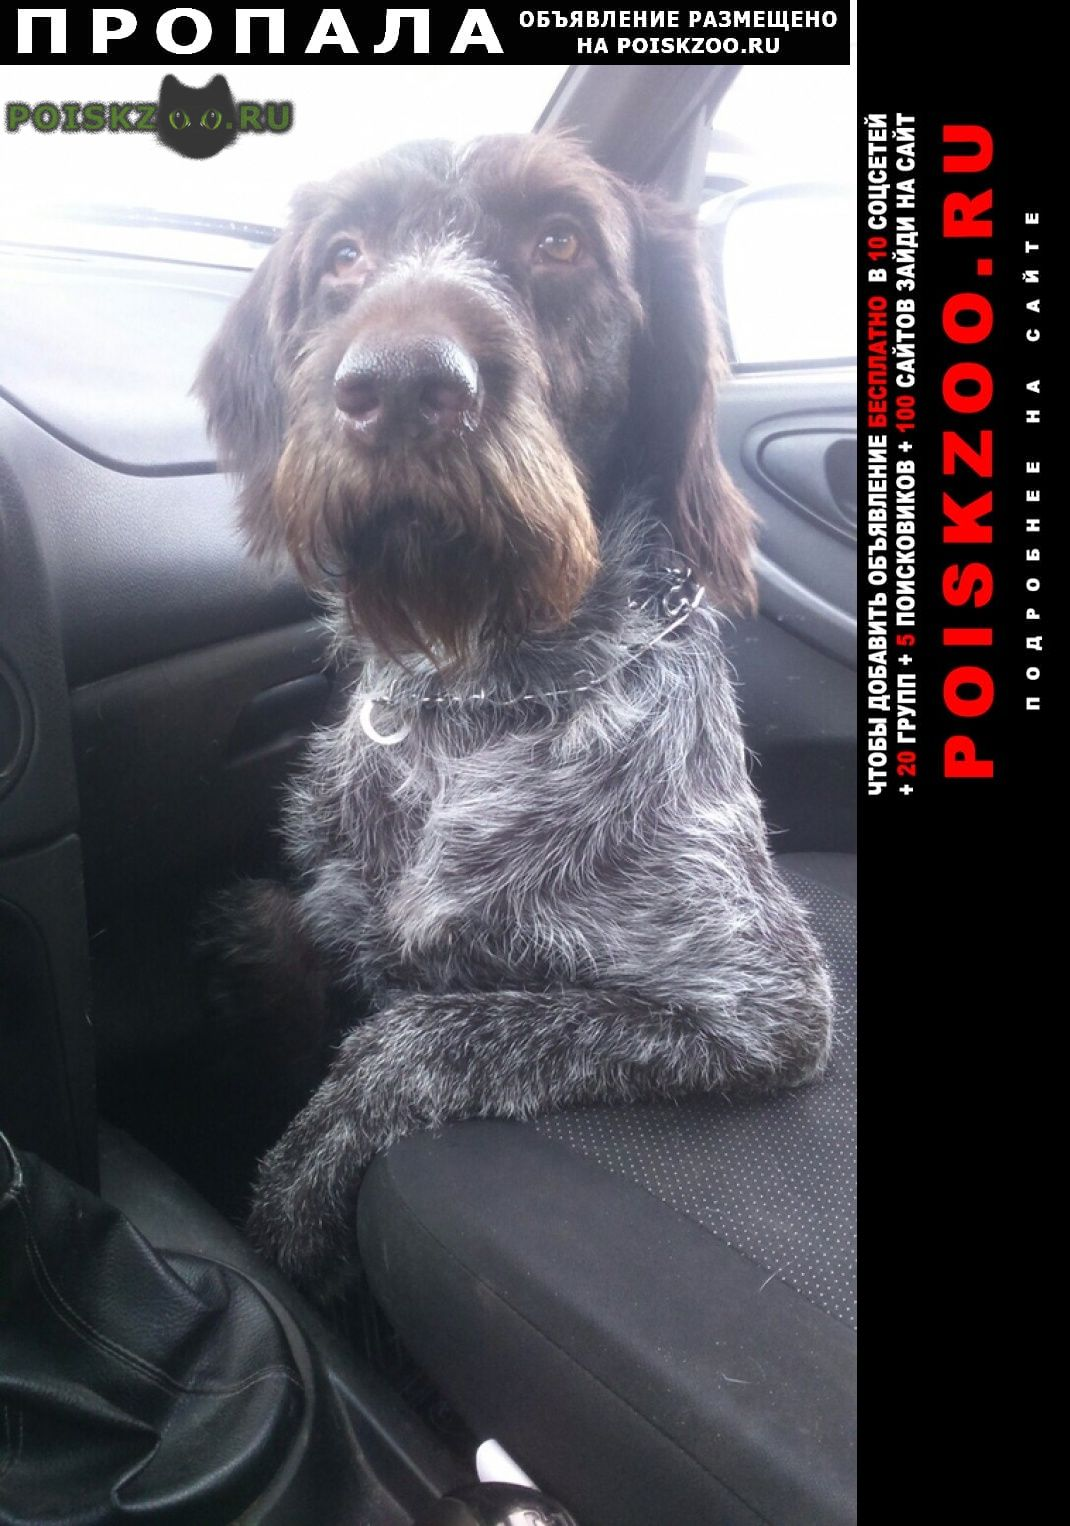 Пропала собака кобель дратхаар г.Бабынино